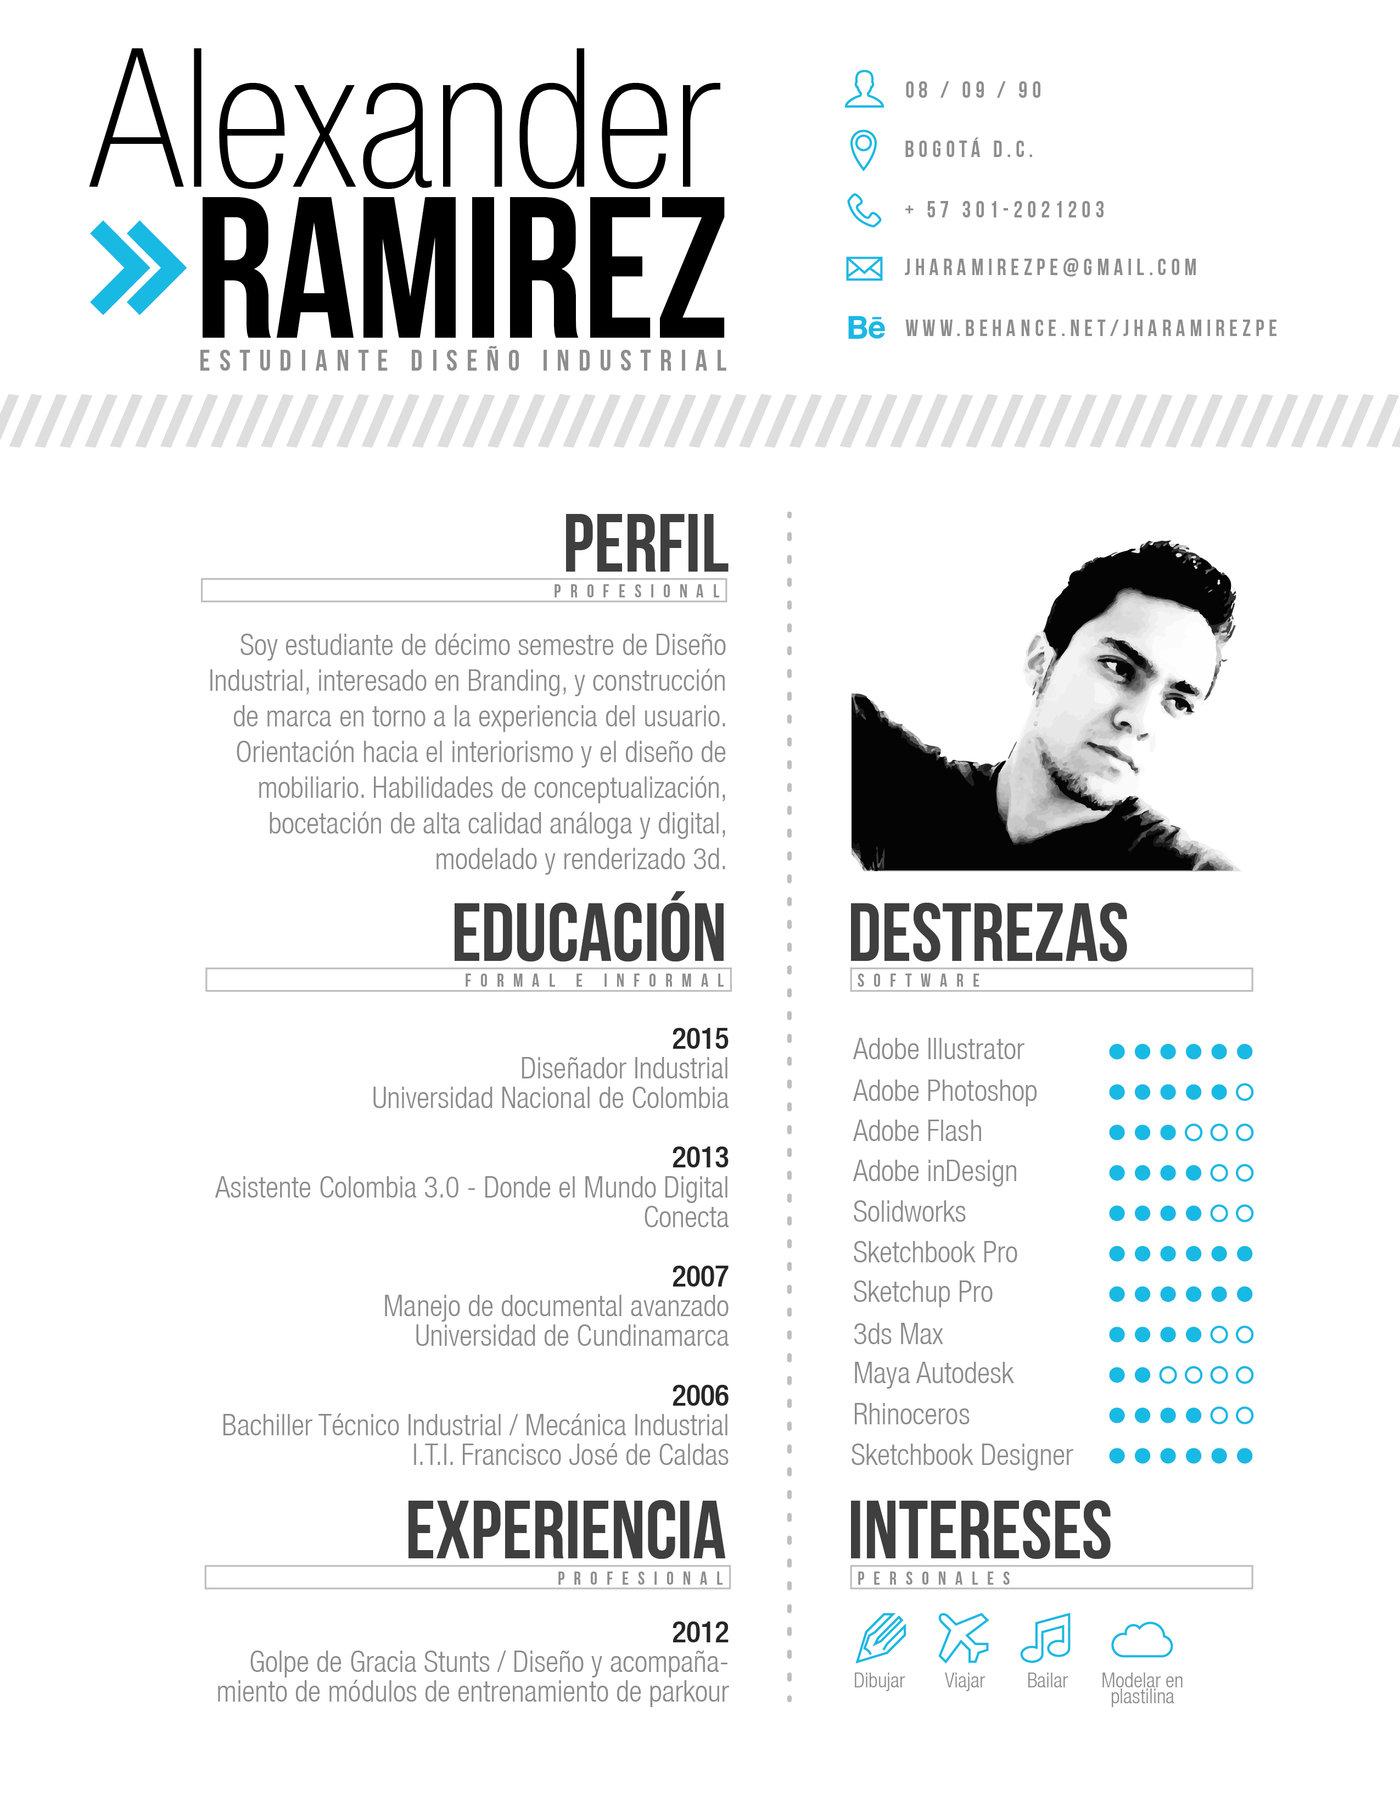 Curriculum Vitae By Jhon Alexander Ramirez Pena At Coroflot Com